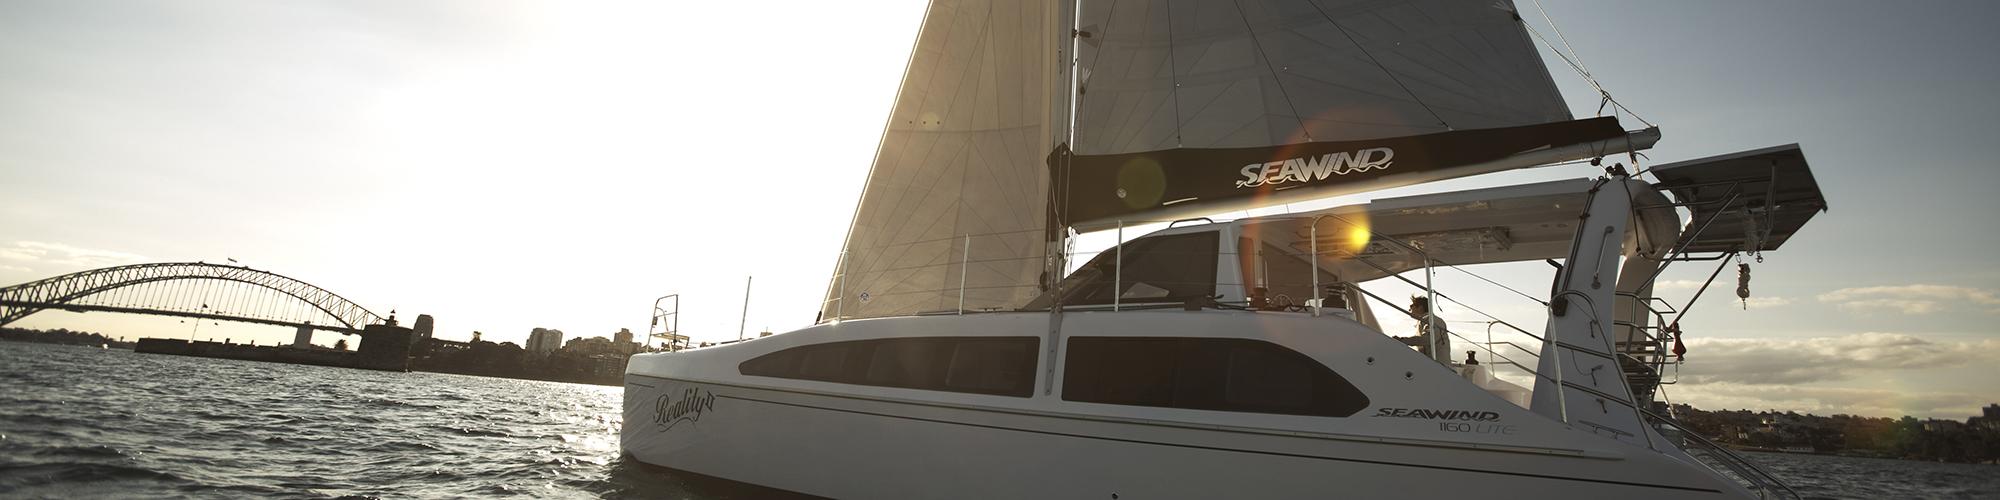 Seawind 1160 Lite2000x500px